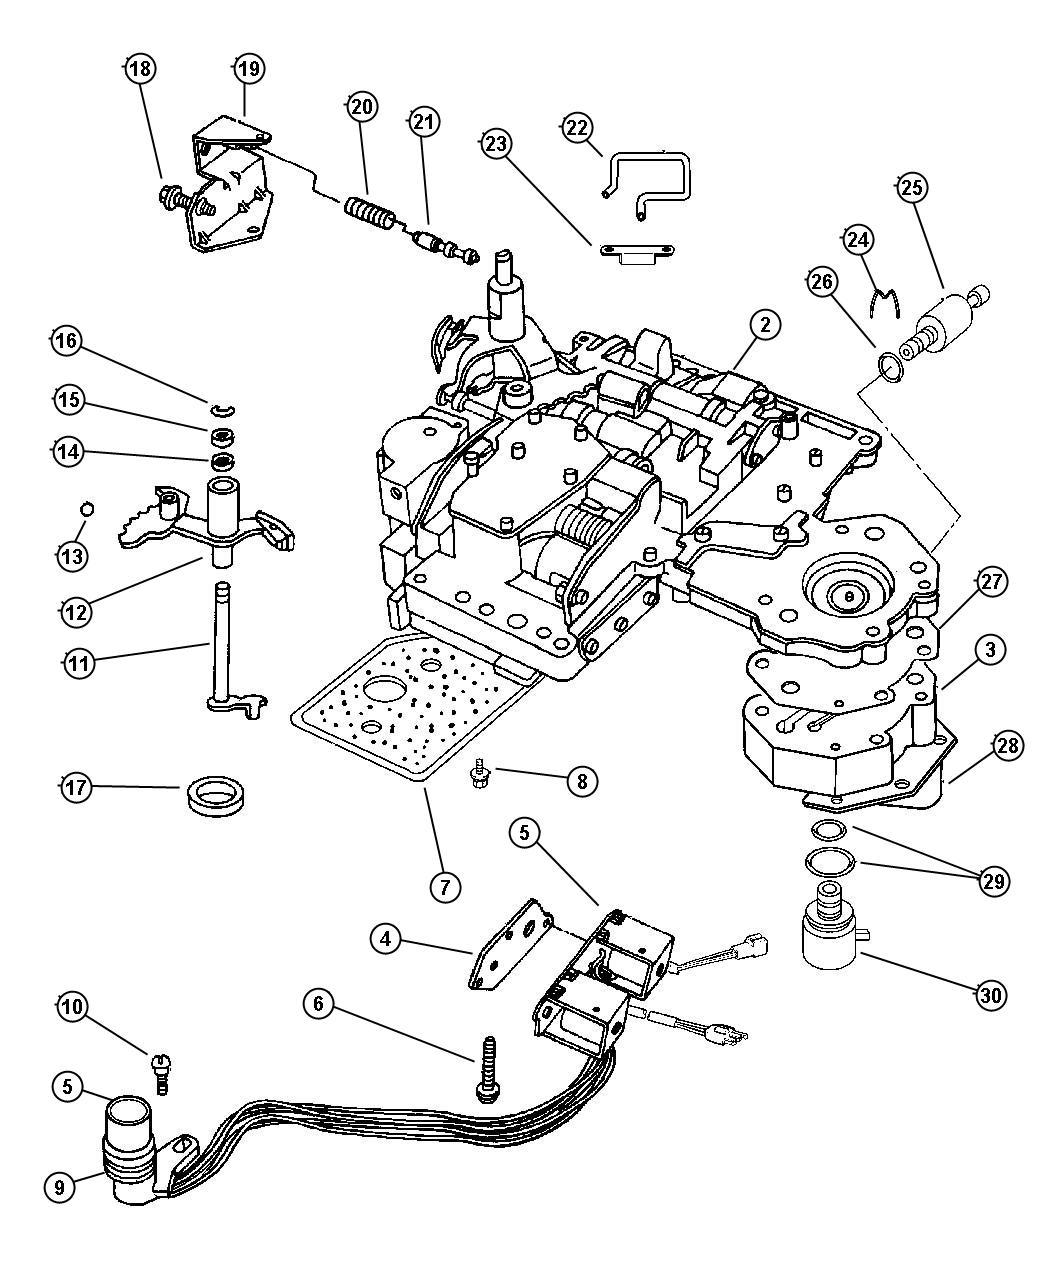 Diagram Dodge 46re Transmission Diagram Full Version Hd Quality Transmission Diagram Sitexdoney Fattoriagarbole It